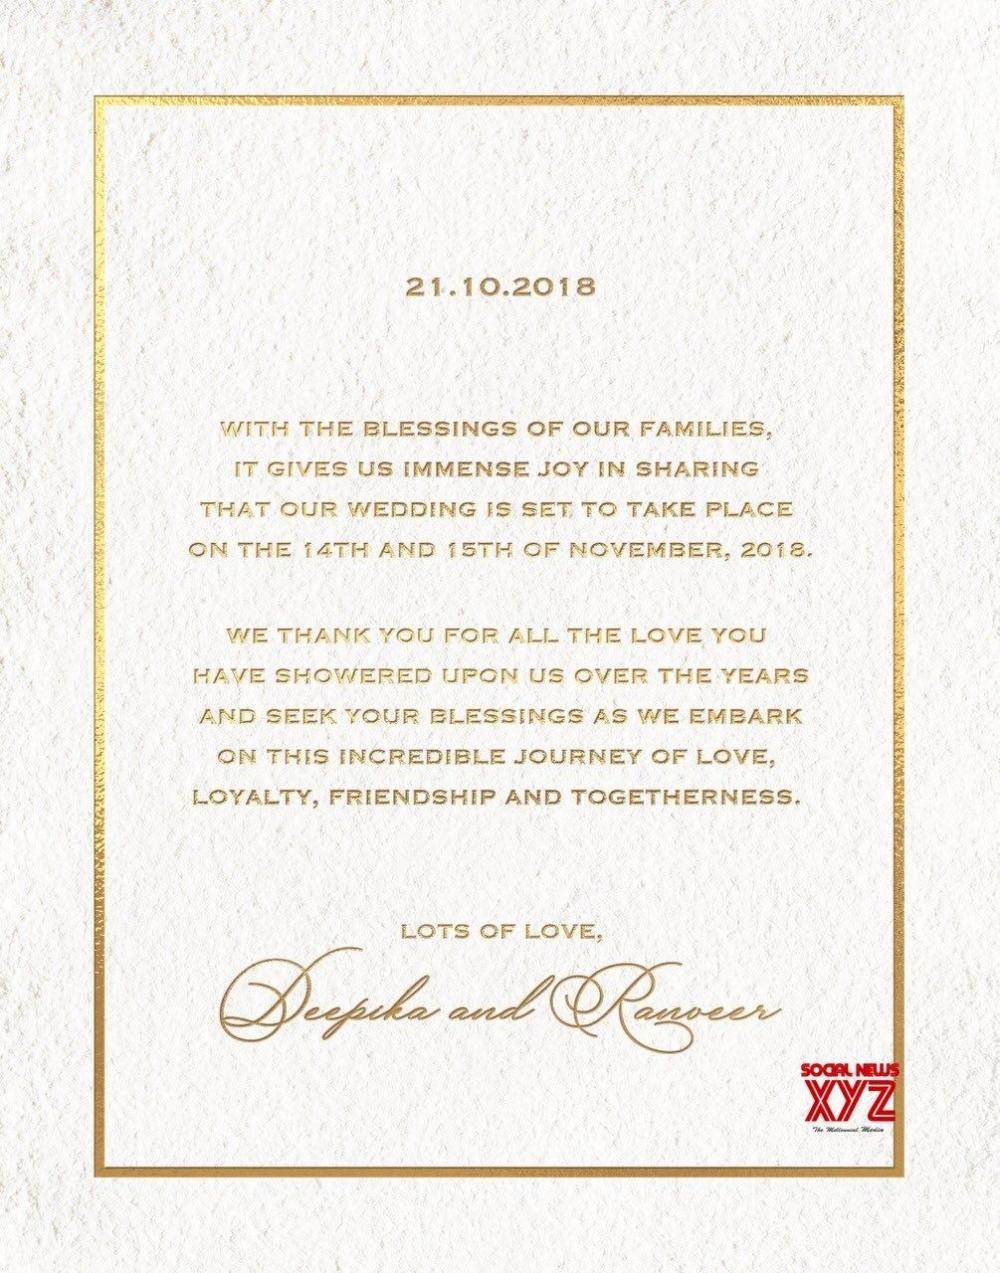 Deepika Padukone Wedding Card Google Search Wedding Invitation Cards Deepika Padukone Big Wedding